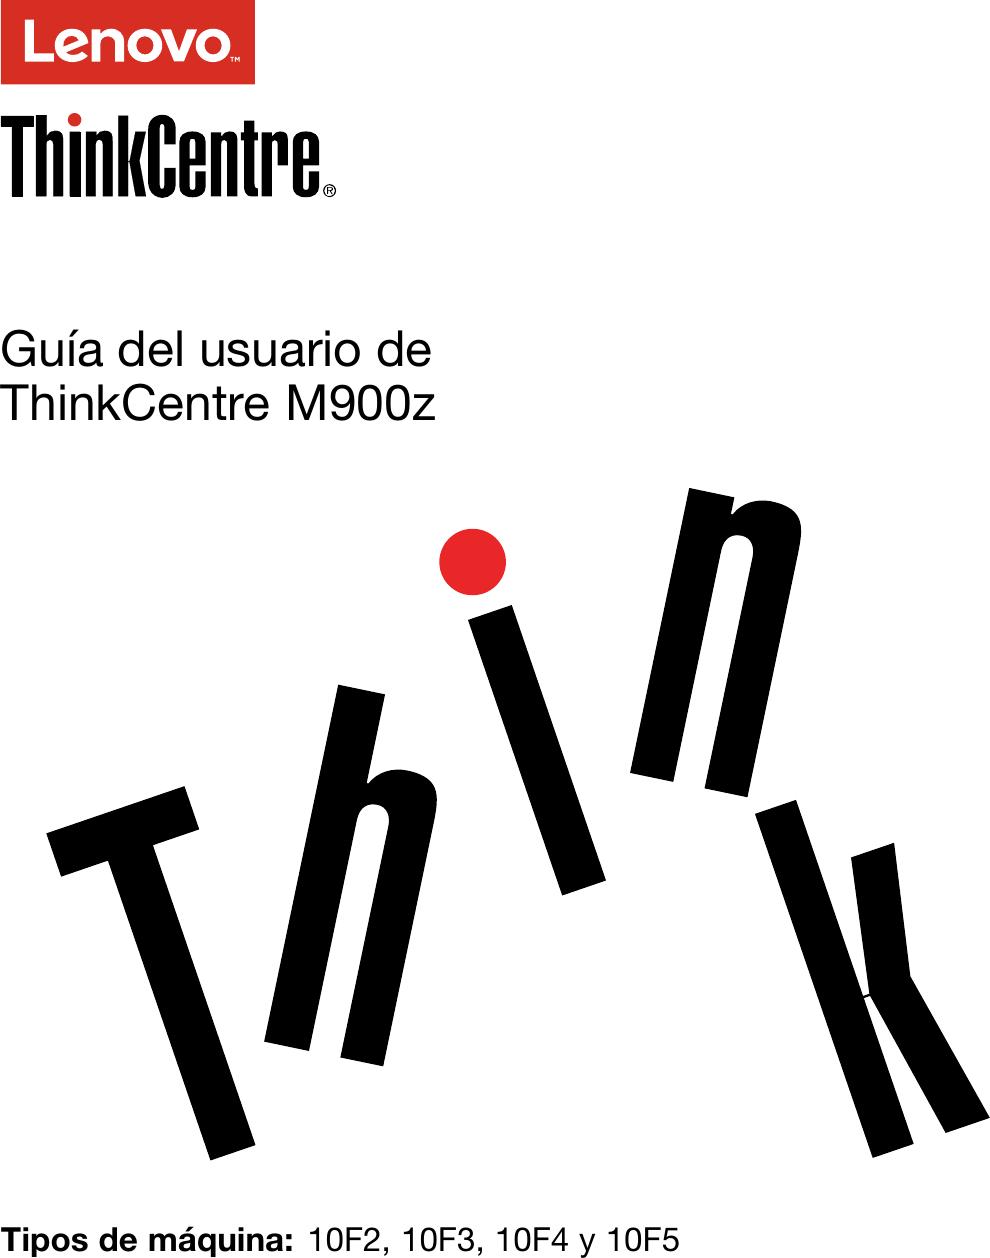 Lenovo M900Z Ug Es User Manual (Spanish) Guide Think